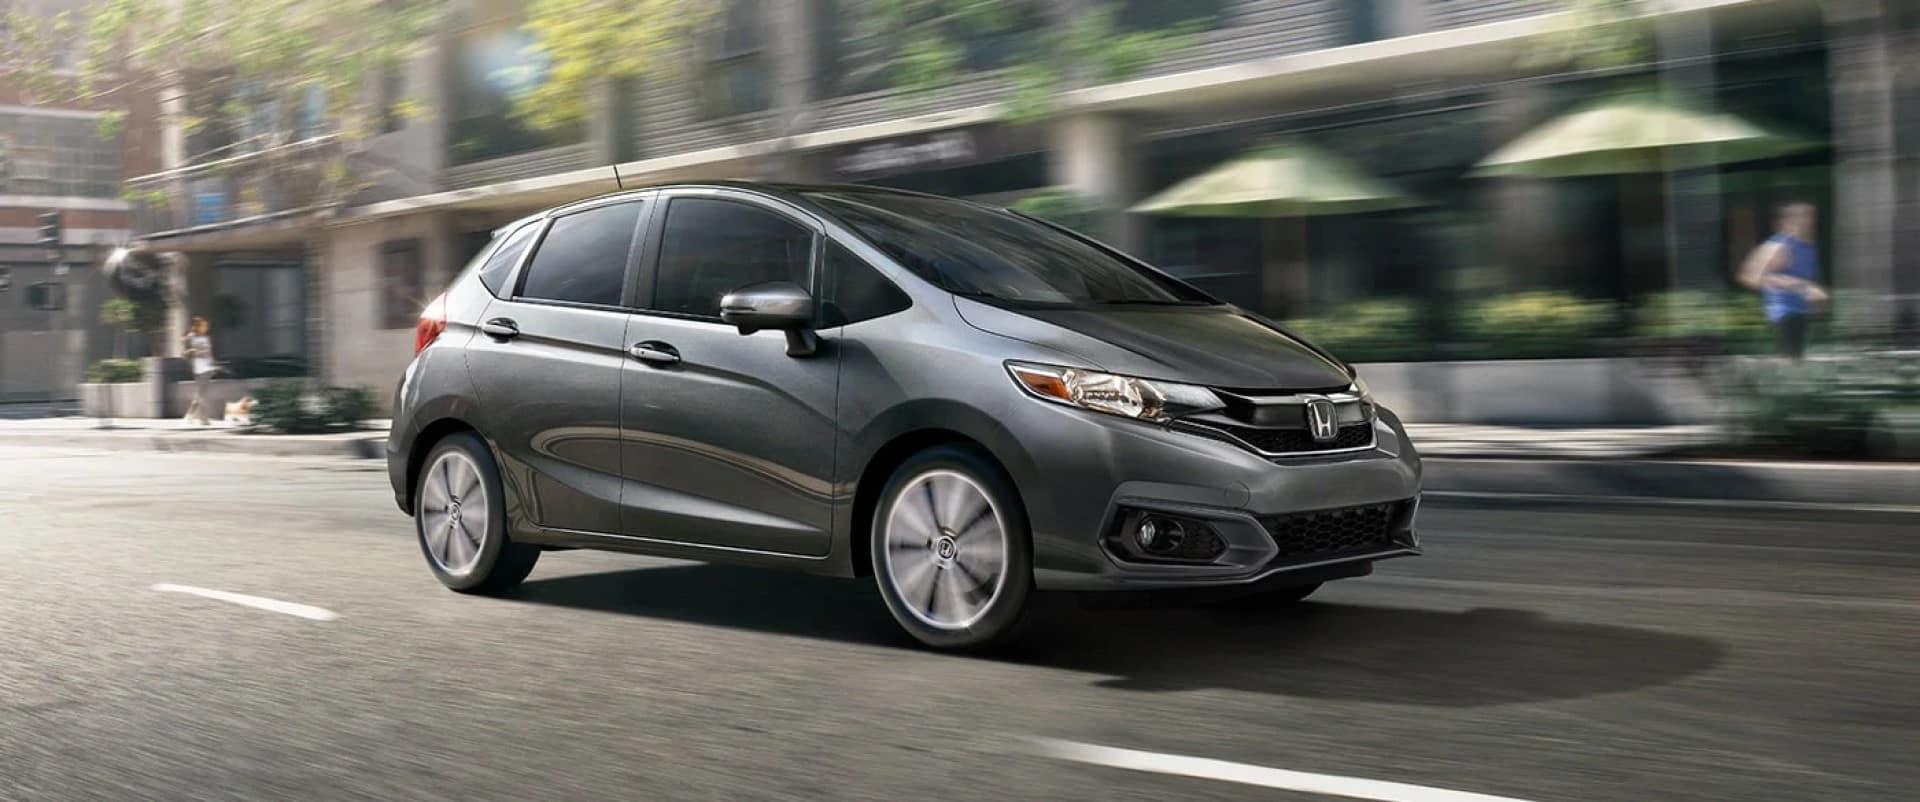 Honda_Fit_Driving_In_City